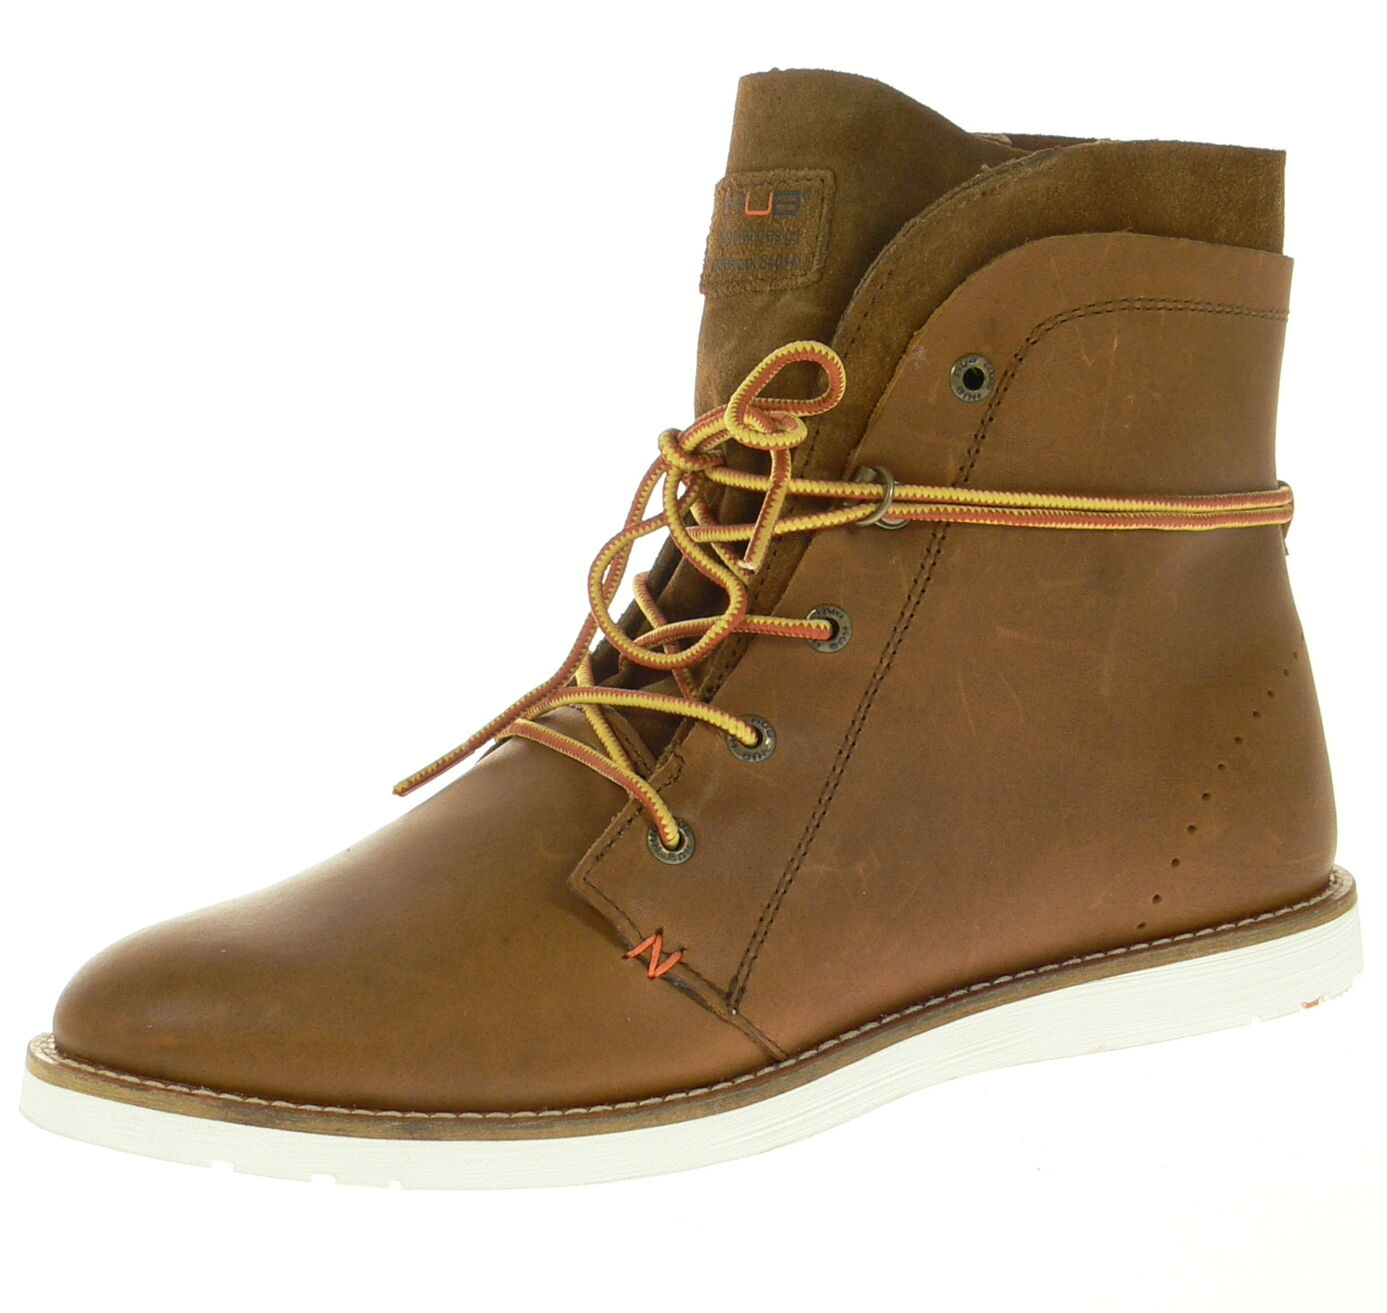 HUB Footwear Herrenschuhe TVR LN Brown Echtleder Winterschuhe NEU SALE Gr. 45